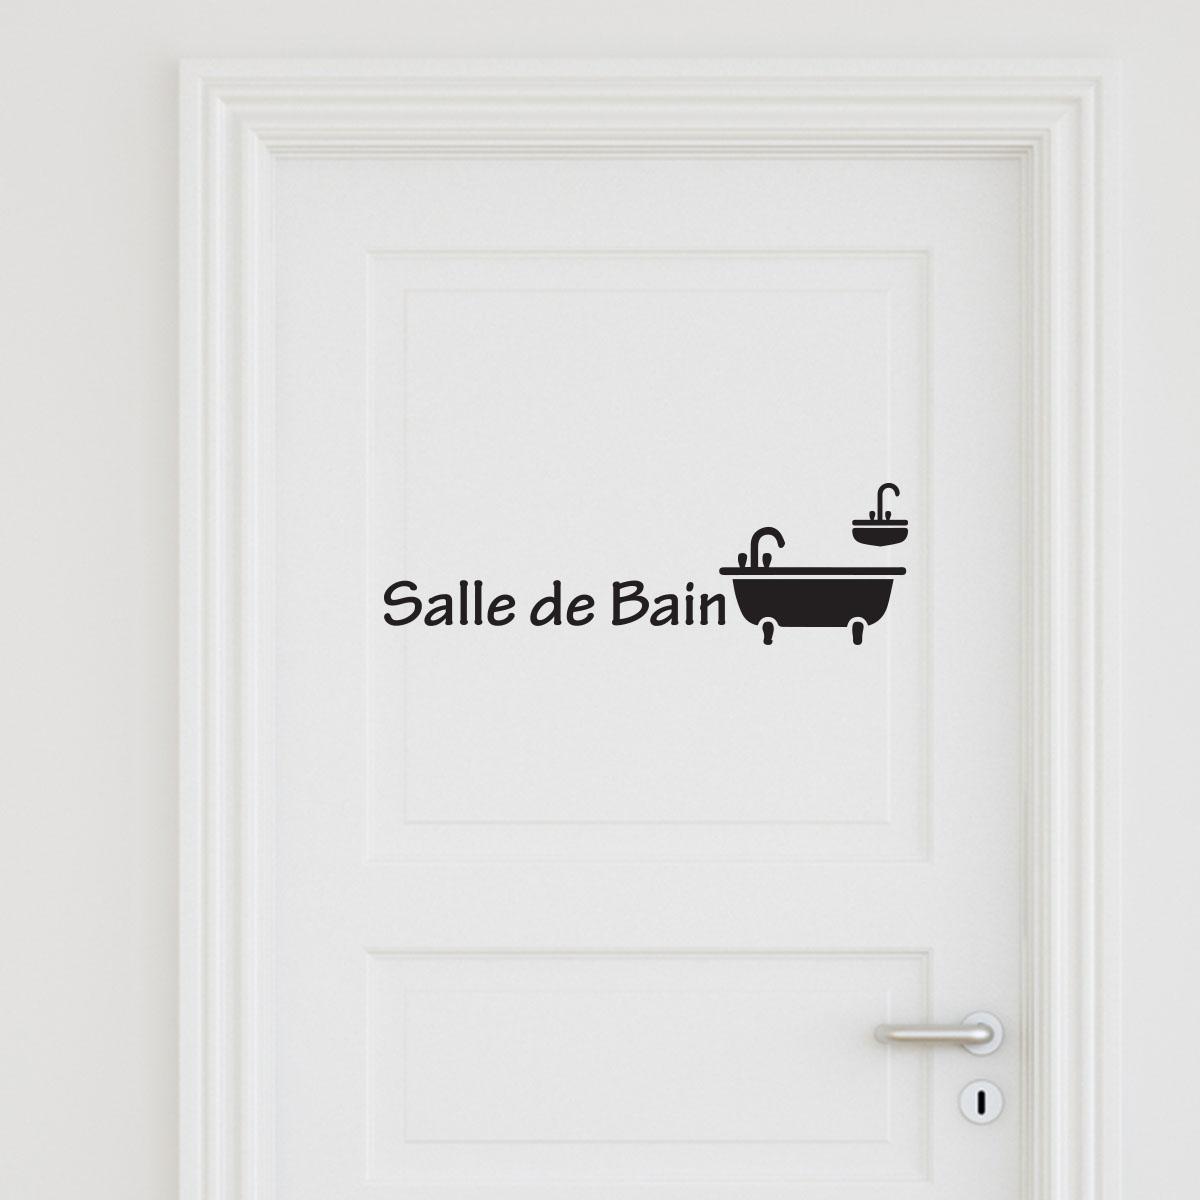 Sticker porte Salle de bain 3  Stickers Portes Salle de bain  Ambiancesticker